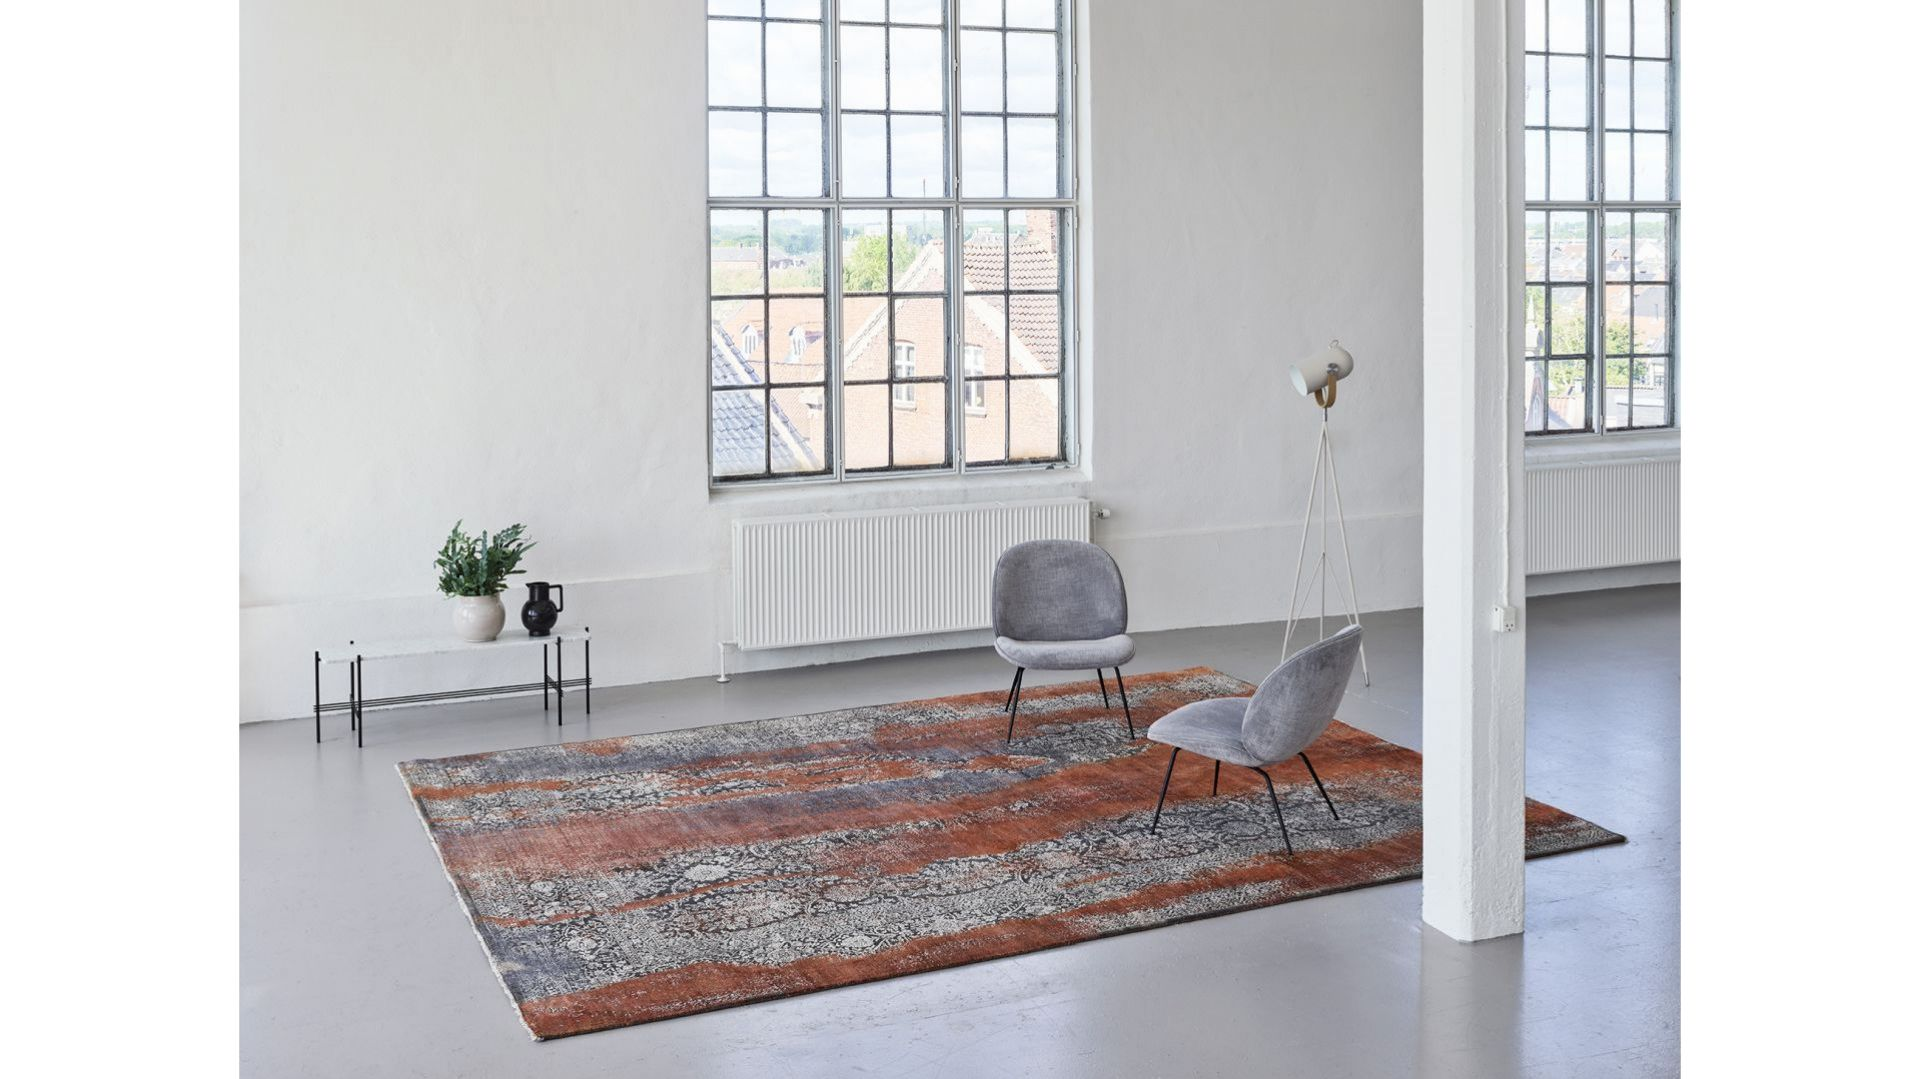 Ręcznei tkany dywan Seduction, Carpets&more